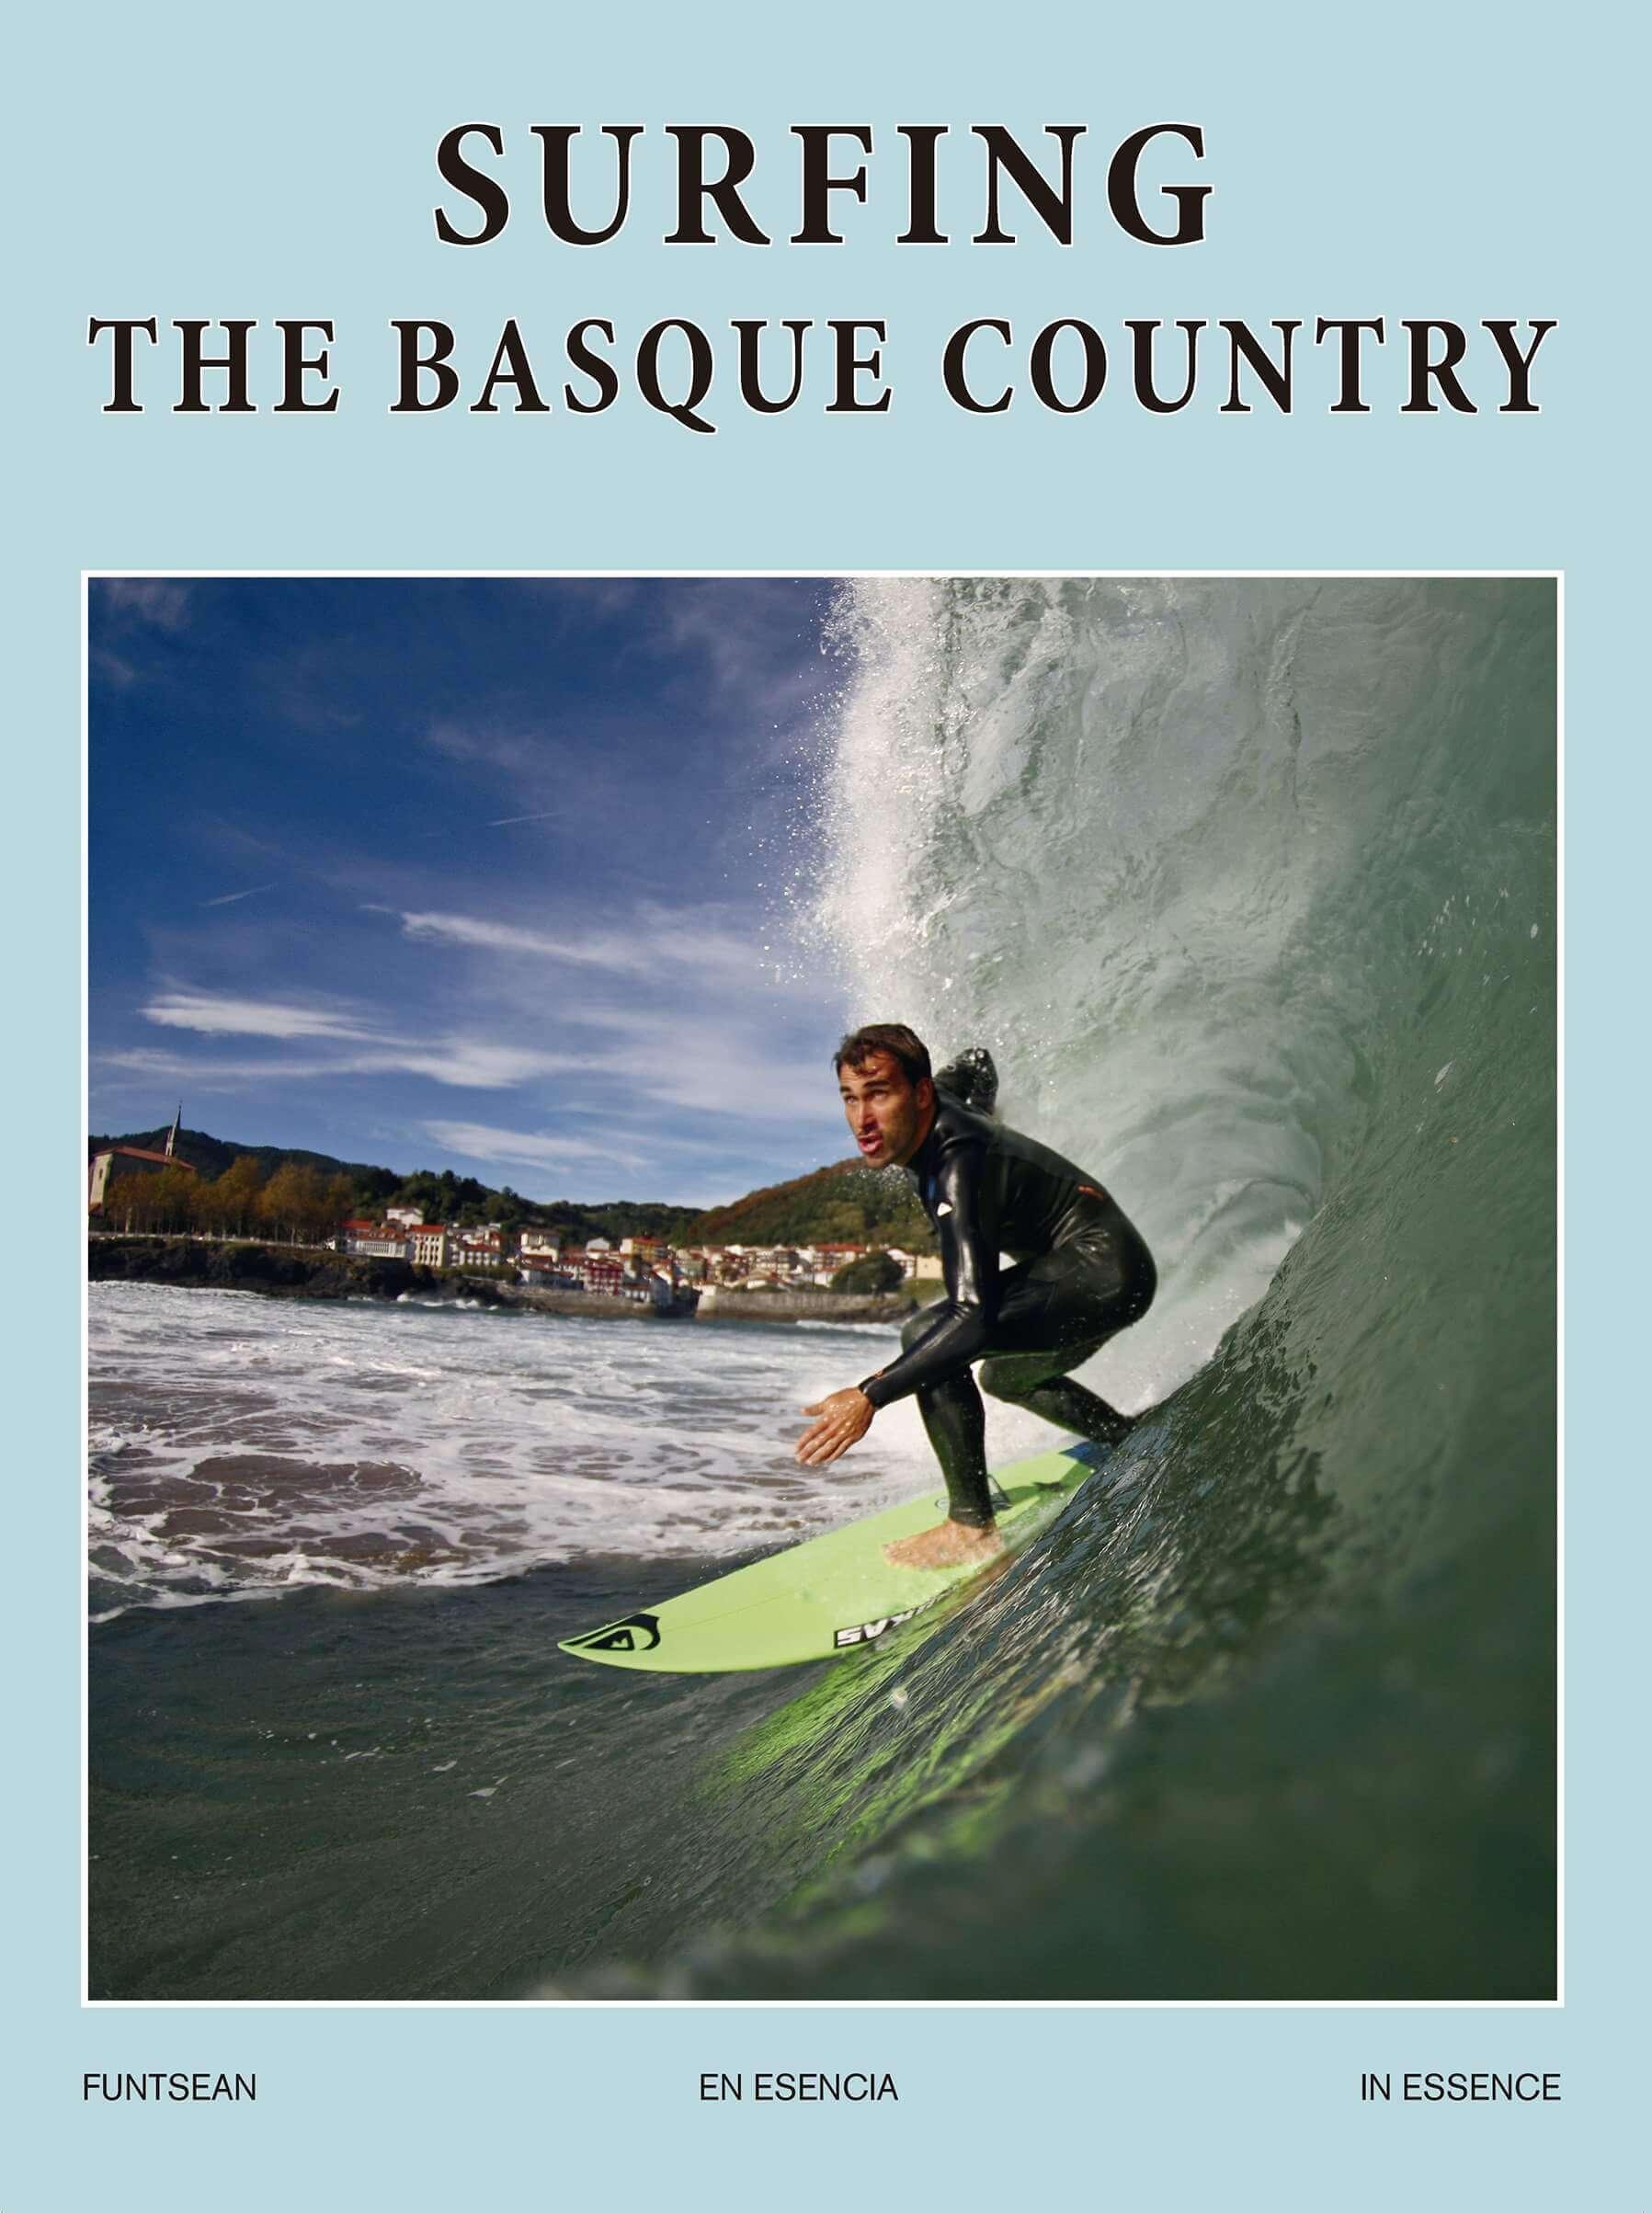 Portada del libro Surfing the Basque Country